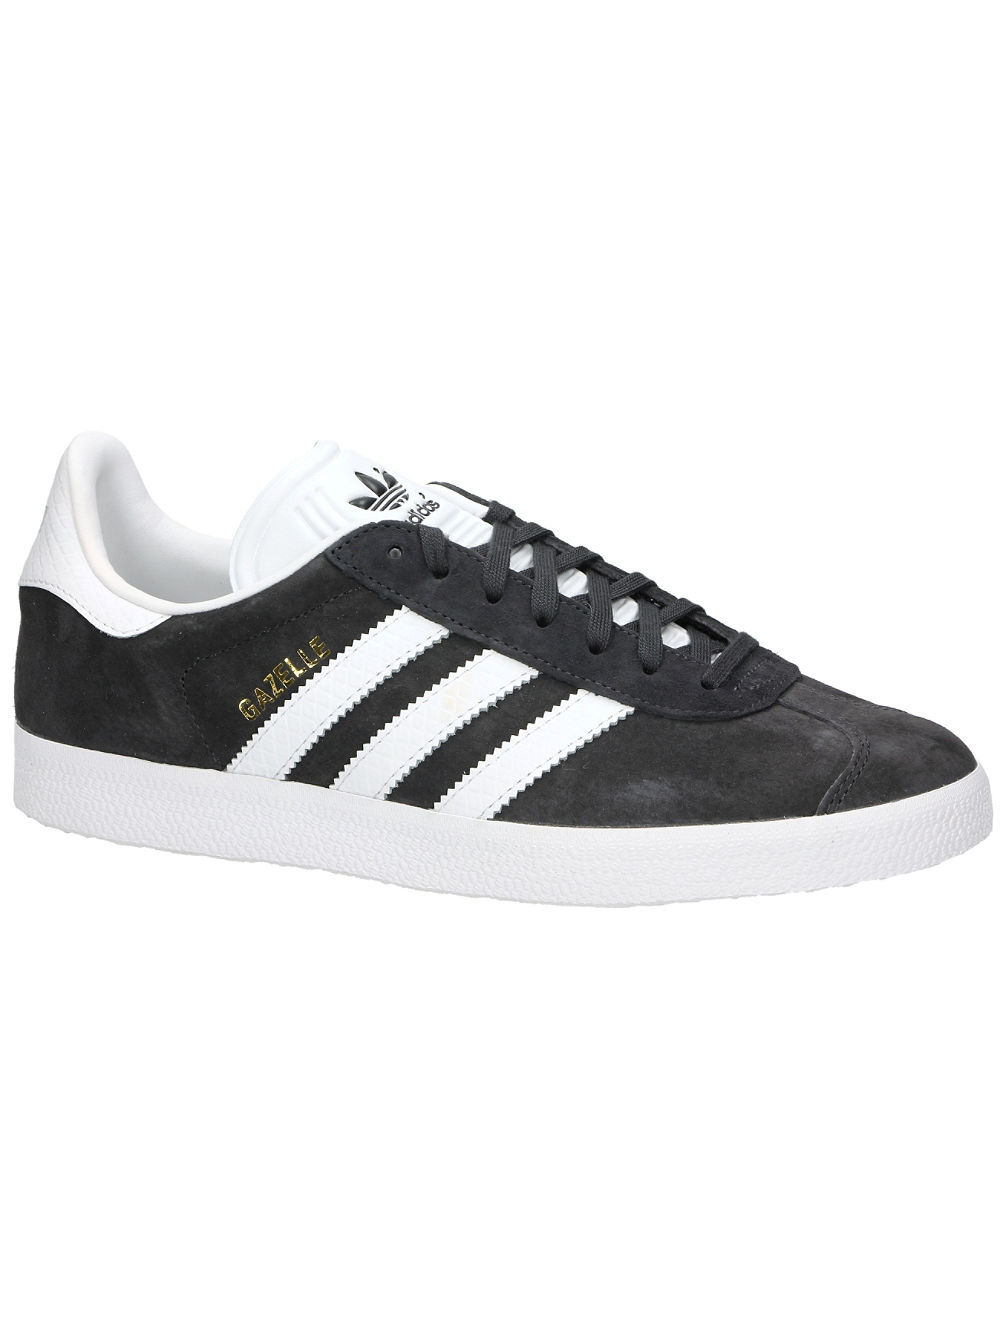 adidas-originals-gazelle-w-sneakers-women